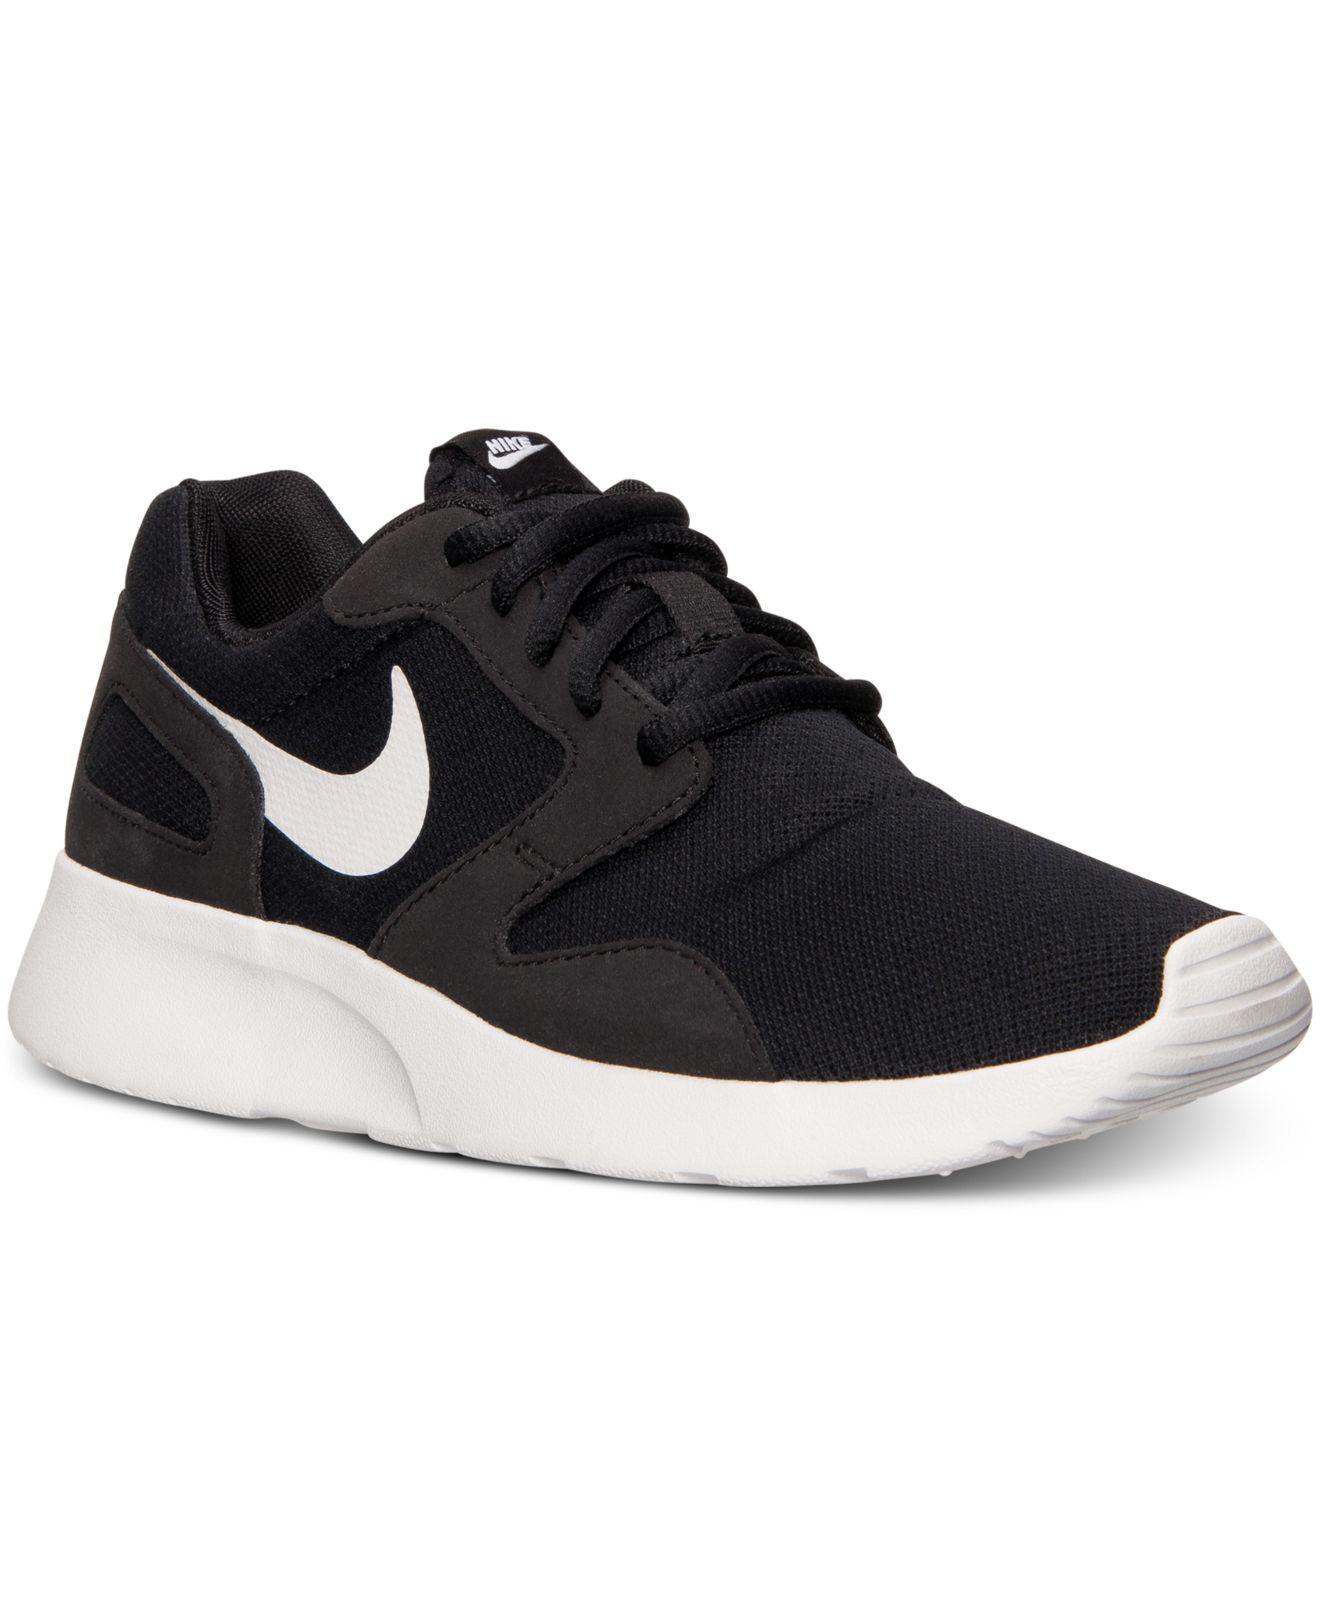 Nike Sneakers Black Women